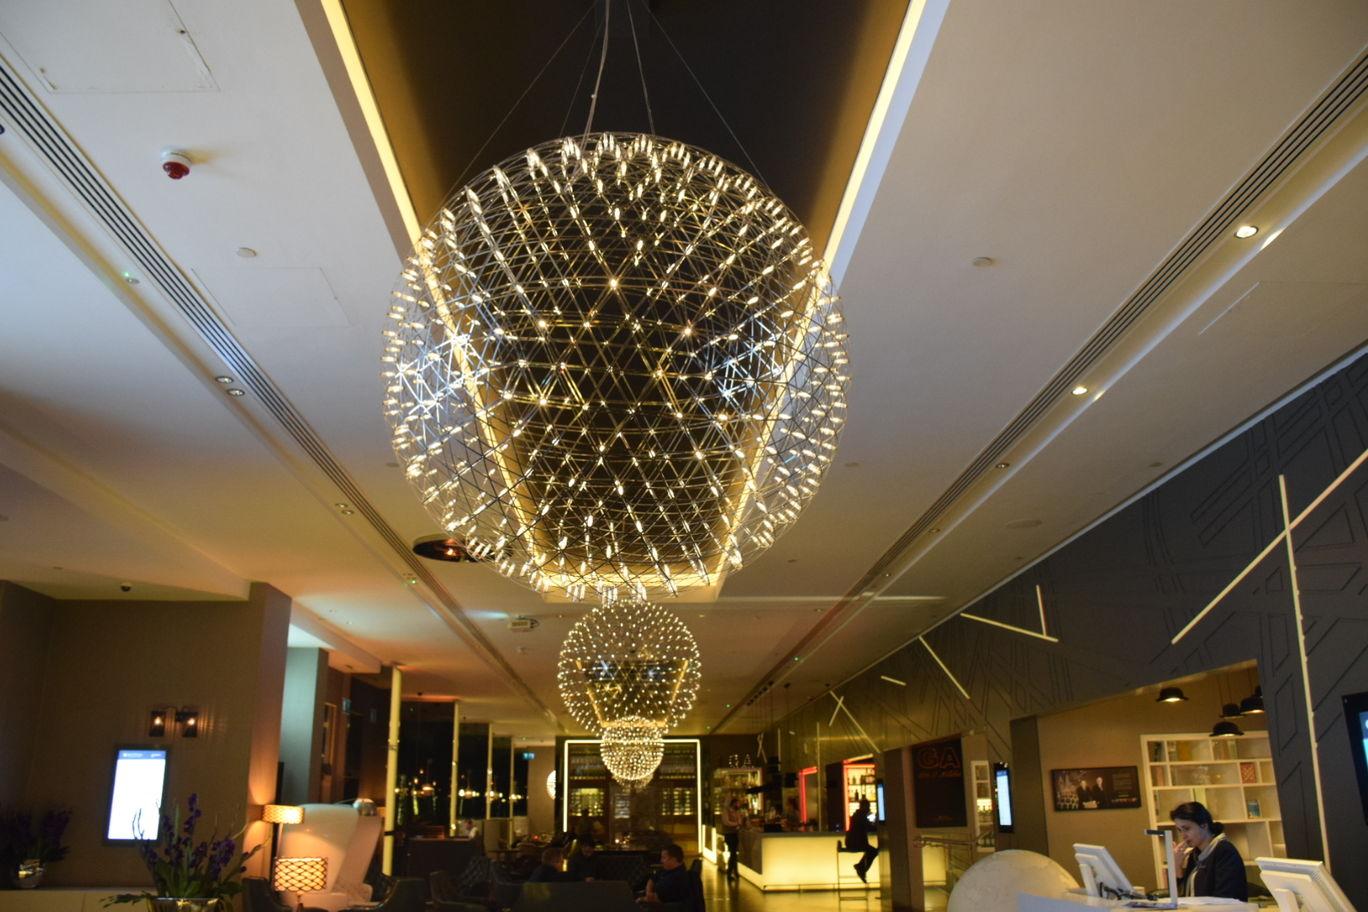 Photo of Pullman London St Pancras Hotel By Charandeep Singh